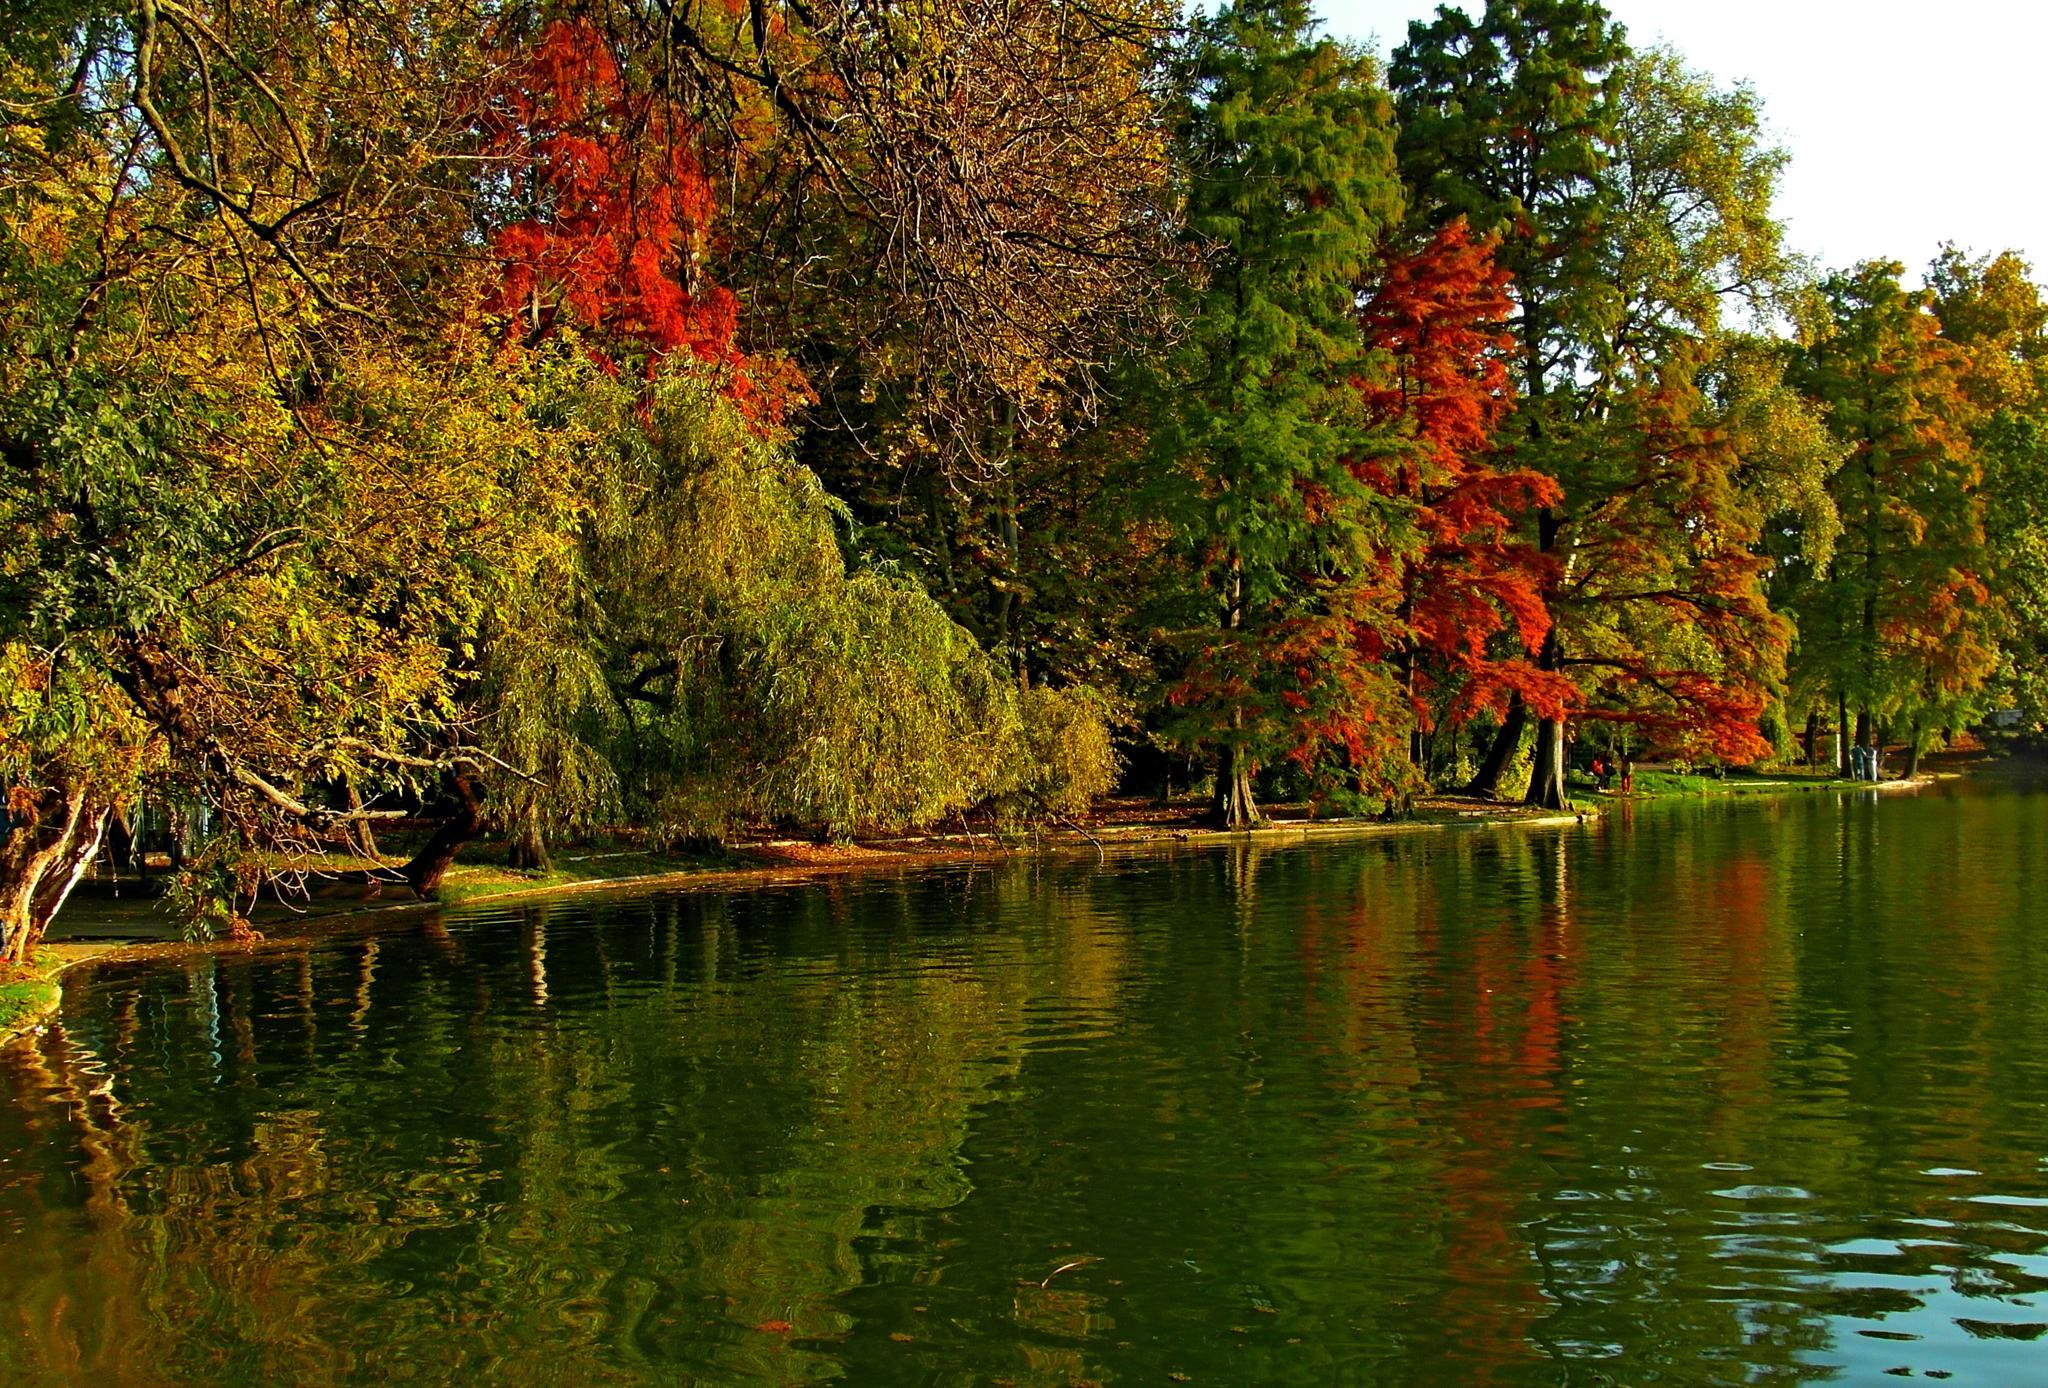 Bucharest.Carol parc by staicugheorghe3